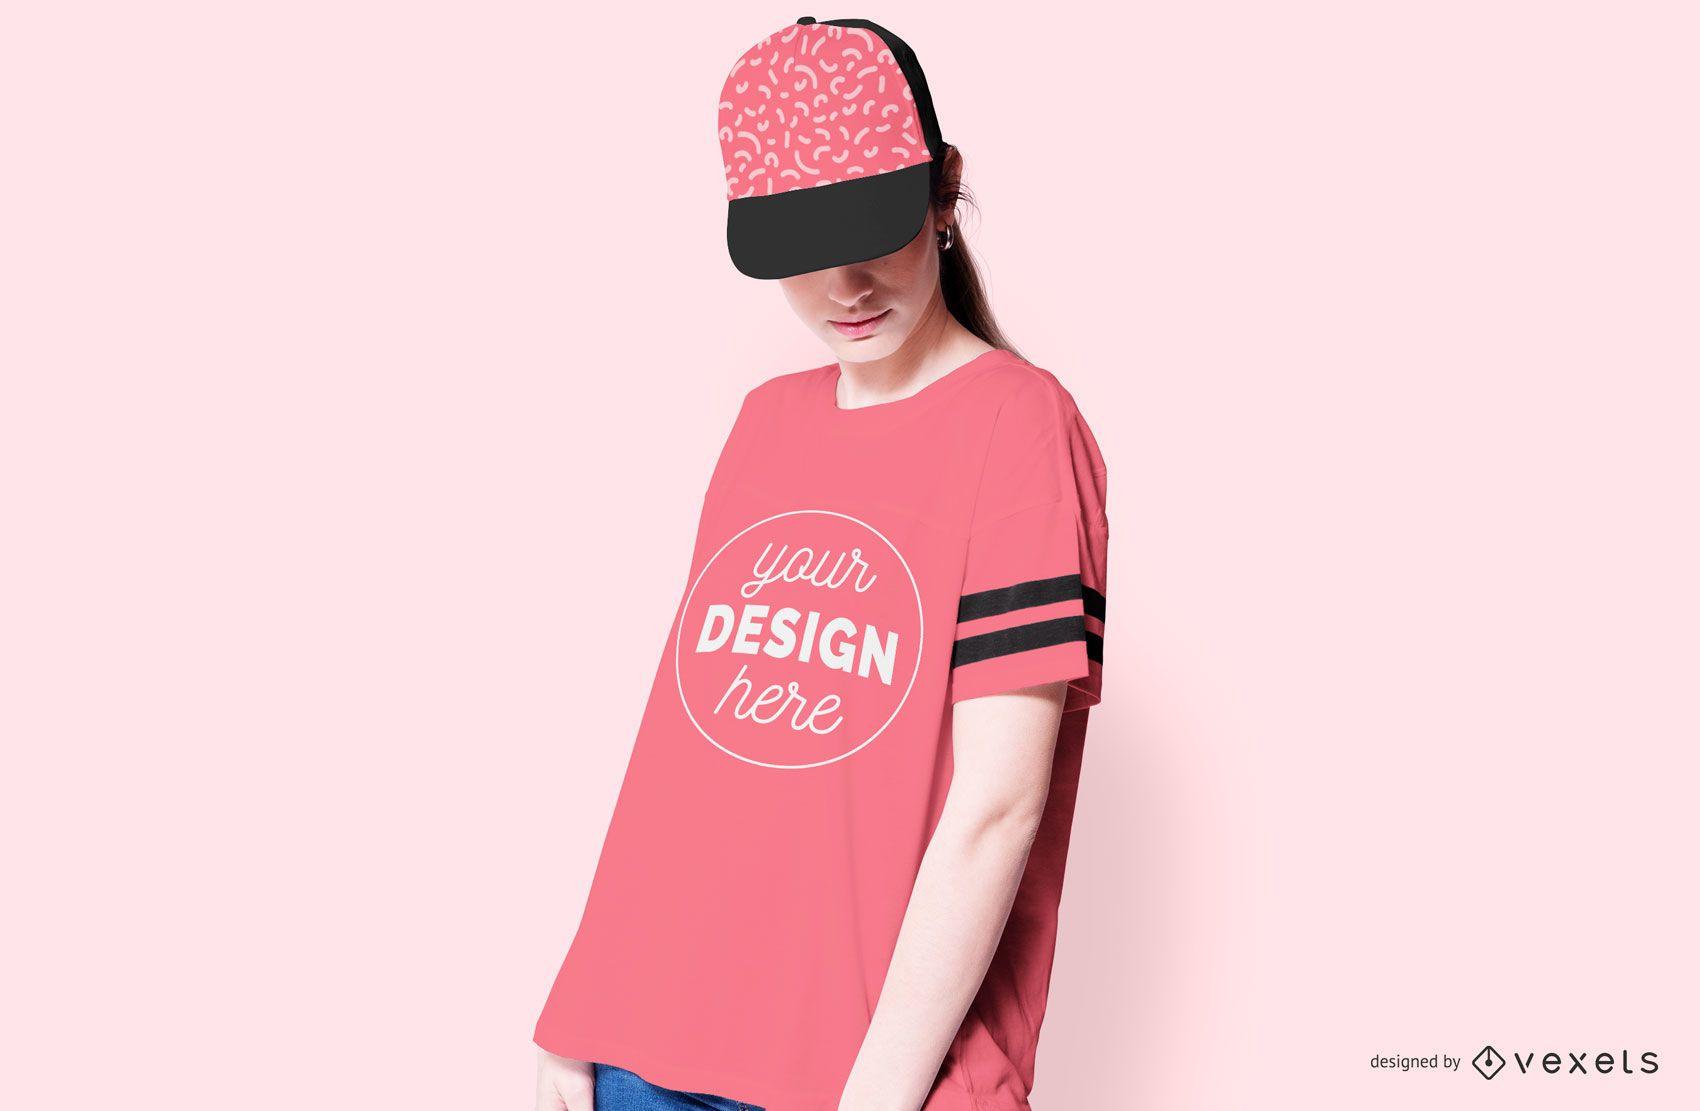 T-shirt and hat model mockup